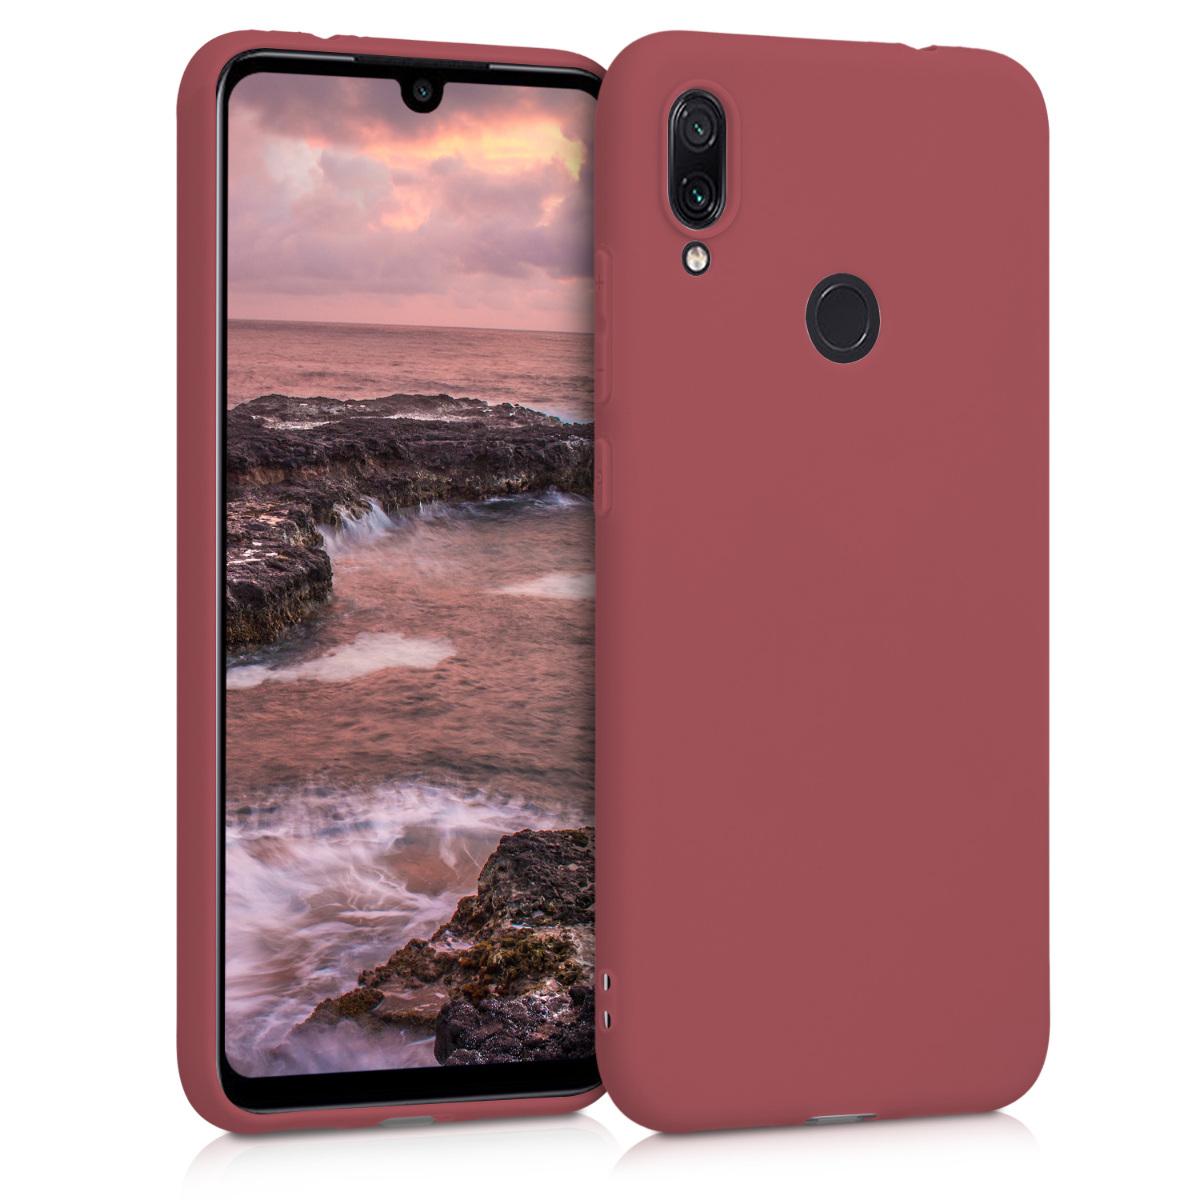 KW Θήκη Σιλικόνης Xiaomi Redmi Note 7 / Note 7 Pro - Maroon Red (47571.160)